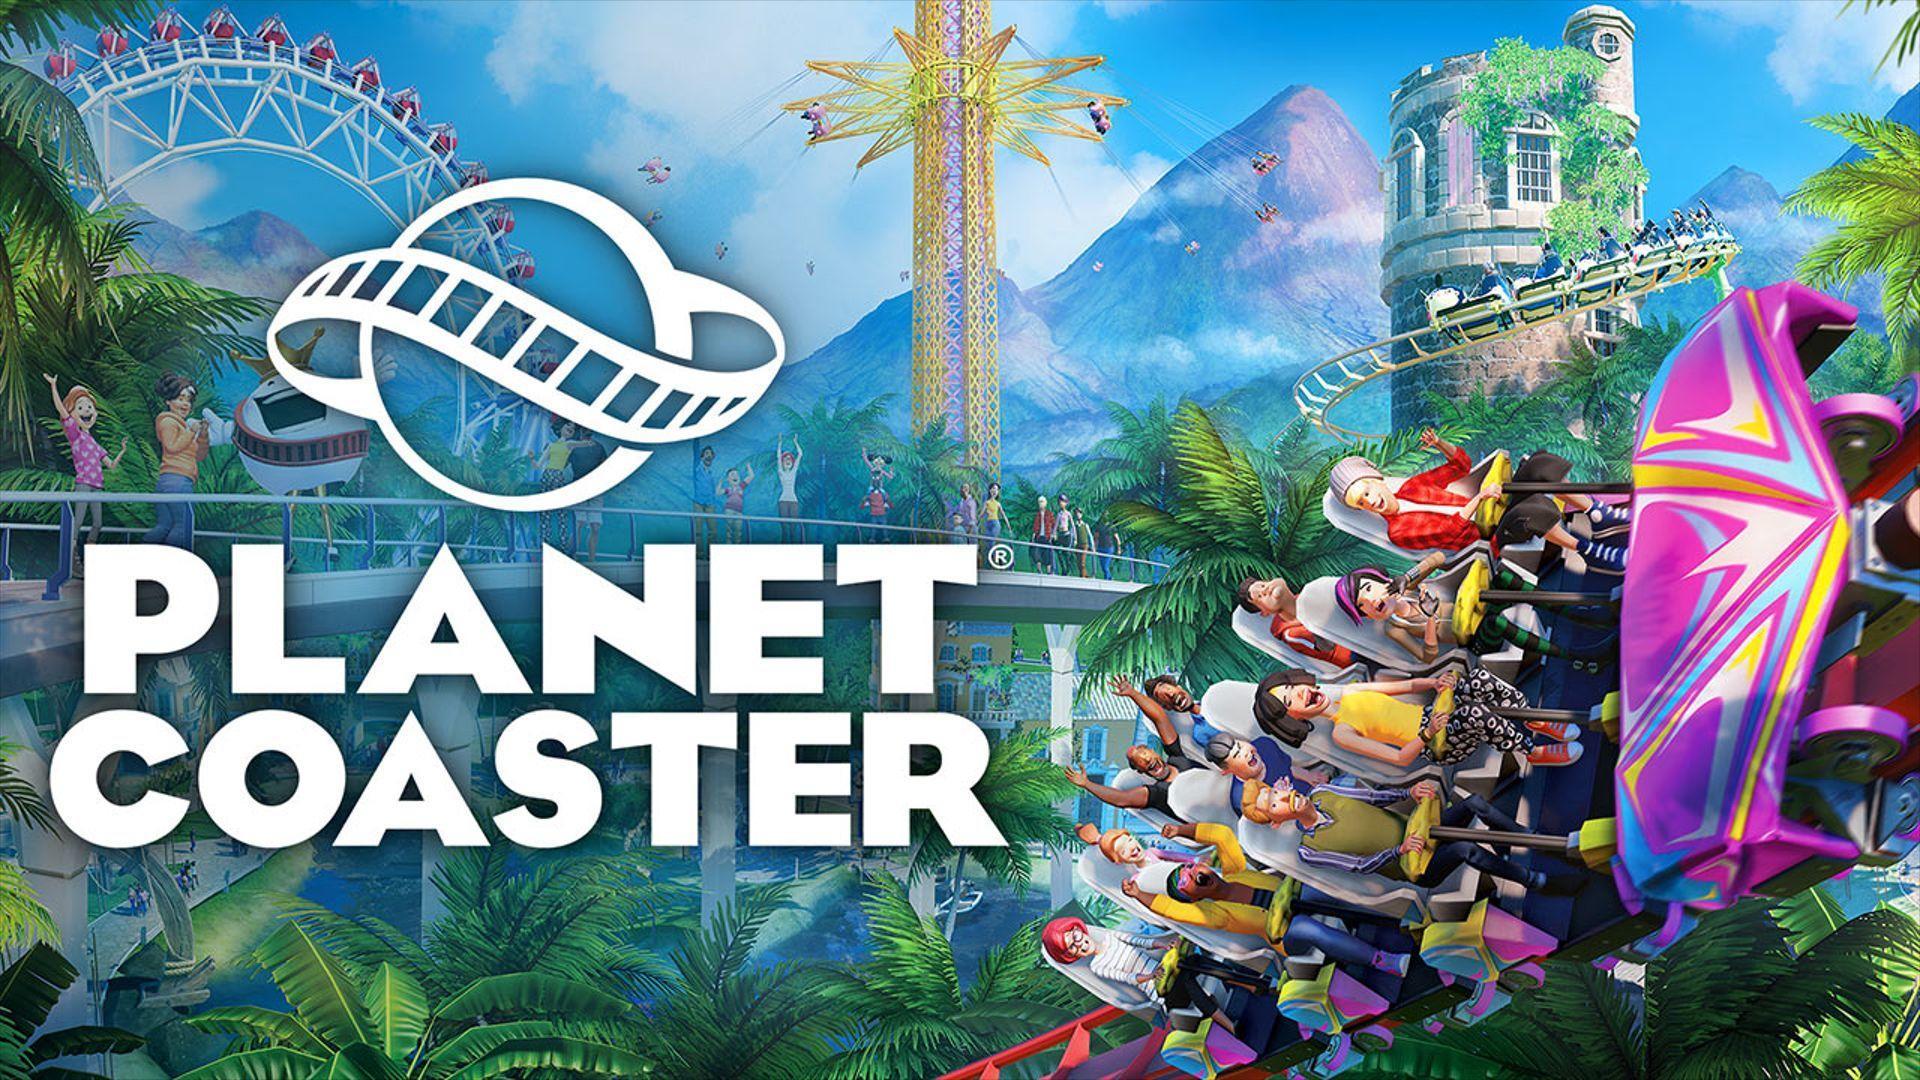 planet coaster wallpaper 72233